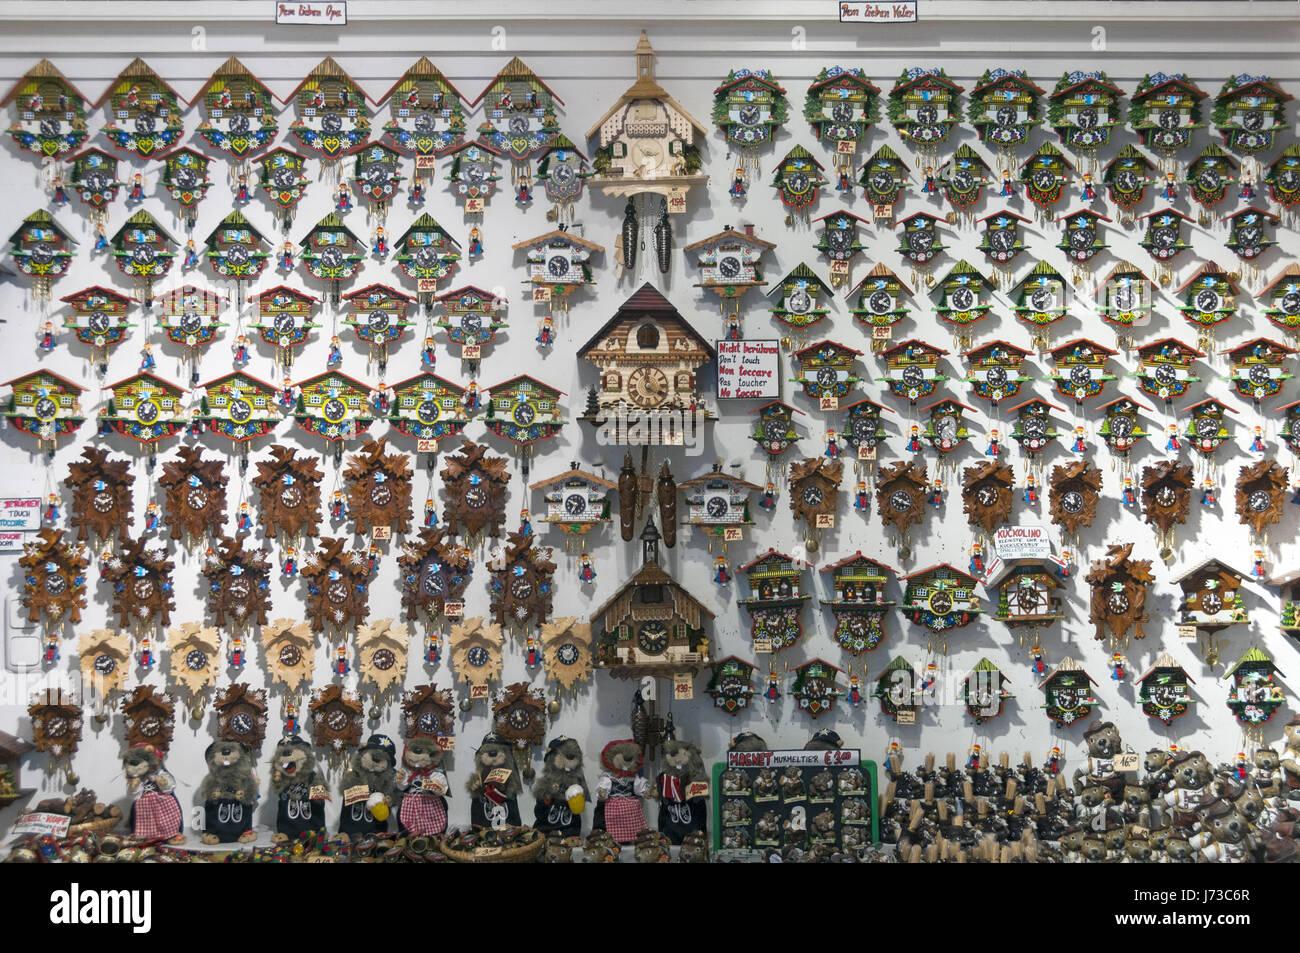 Austria, Salzkammergut, St Wolfgang, cuckoo clocks - Stock Image